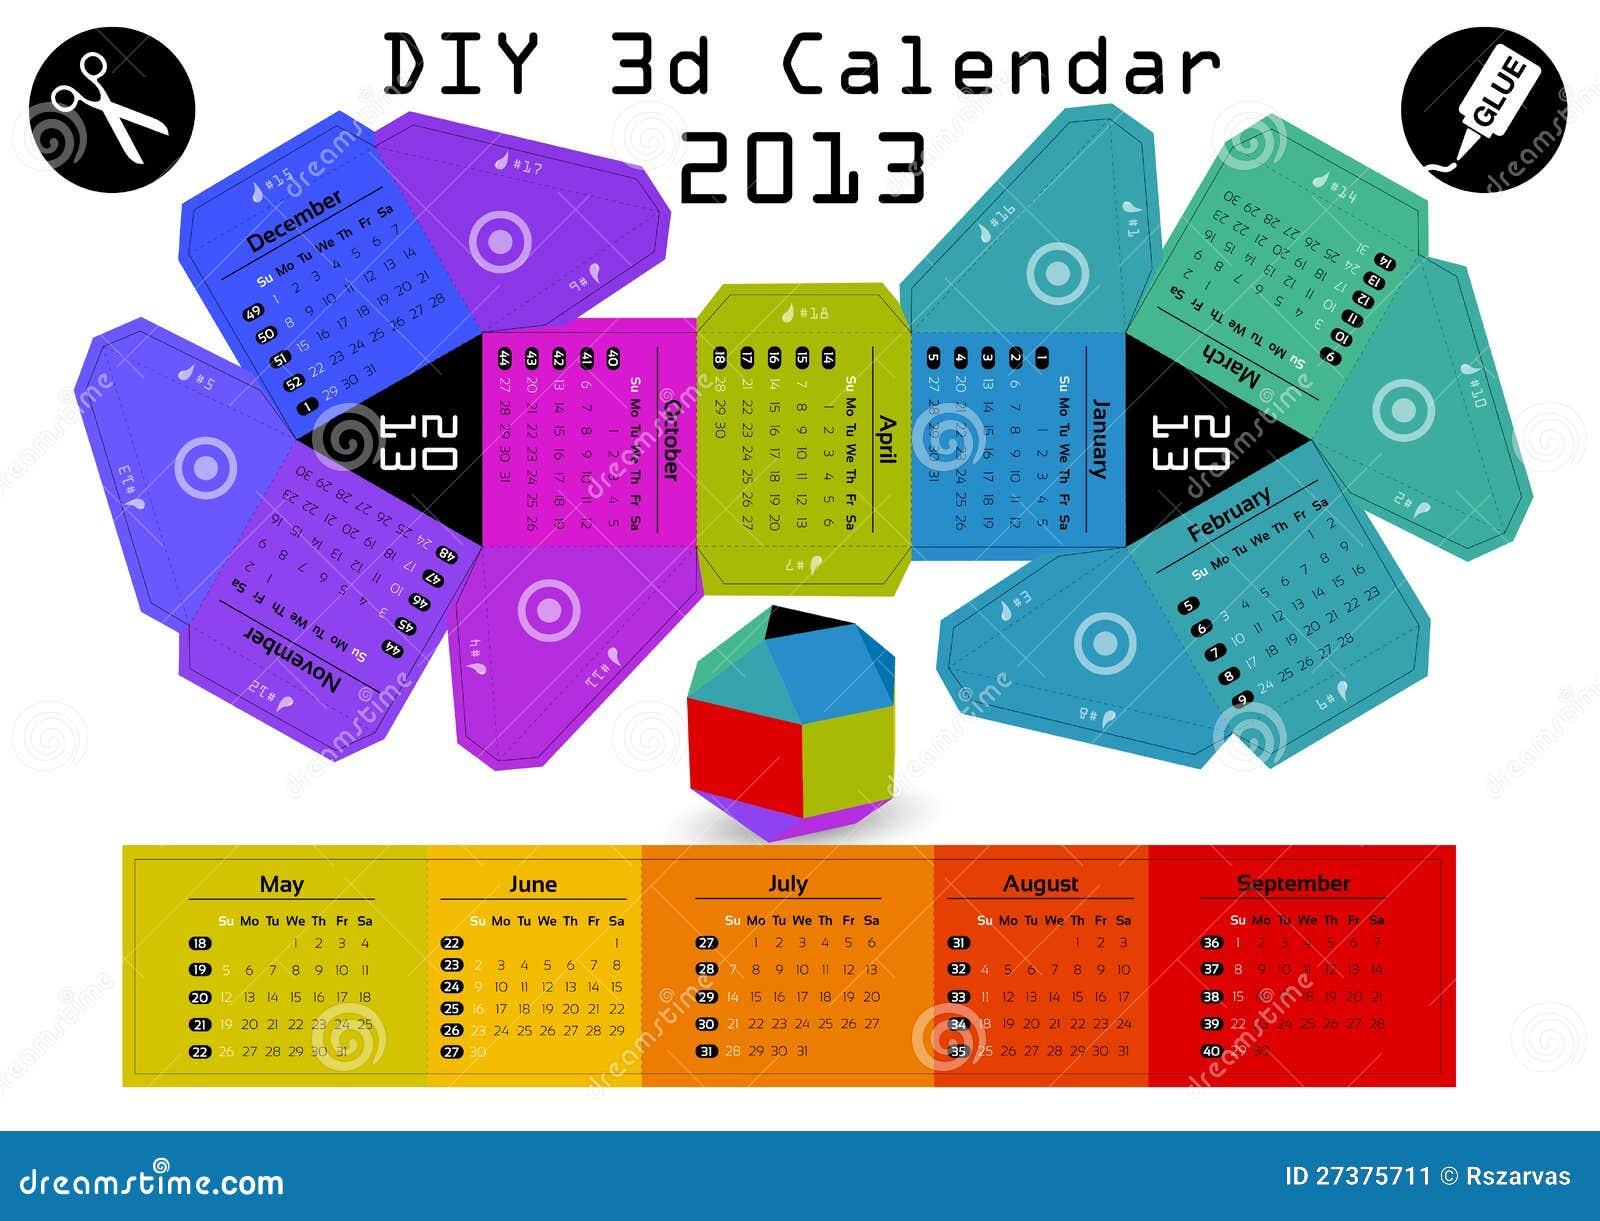 Diy Calendar Size : D diy calendar  inch compiled size stock